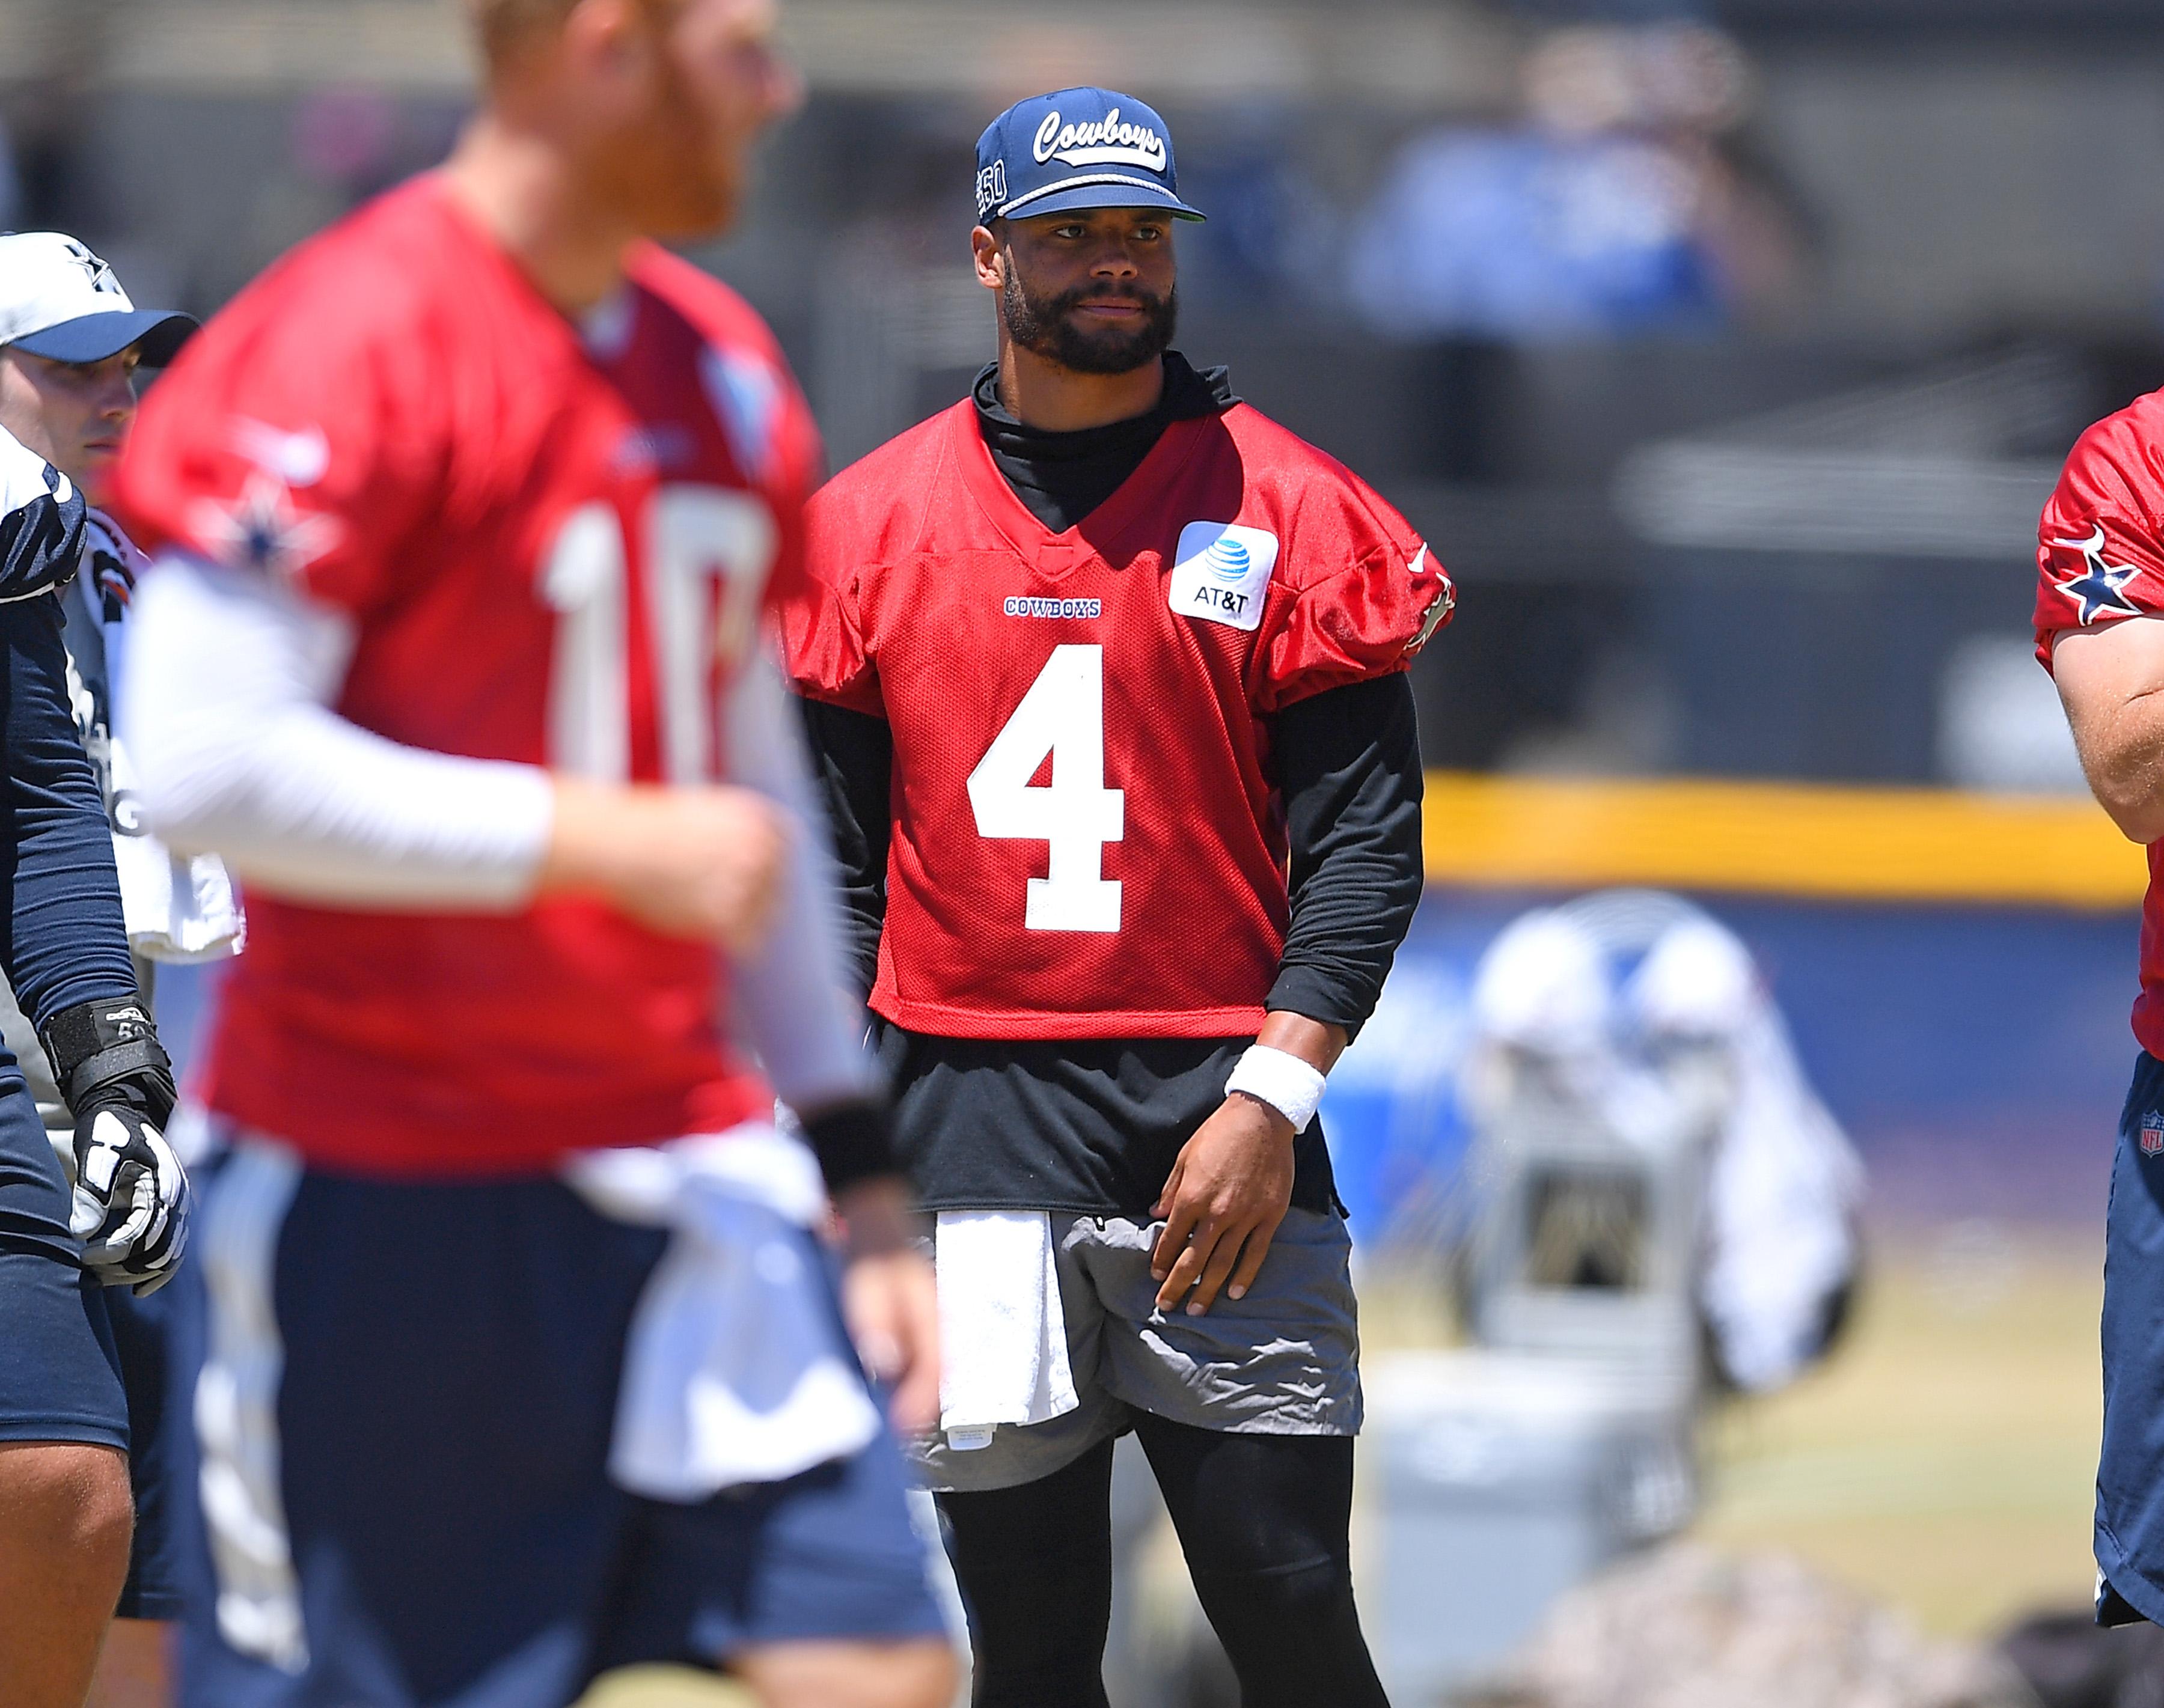 Quarterback Dak Prescott #4 of the Dallas Cowboys looks on during training camp at River Ridge Complex on August 3, 2021 in Oxnard, California.